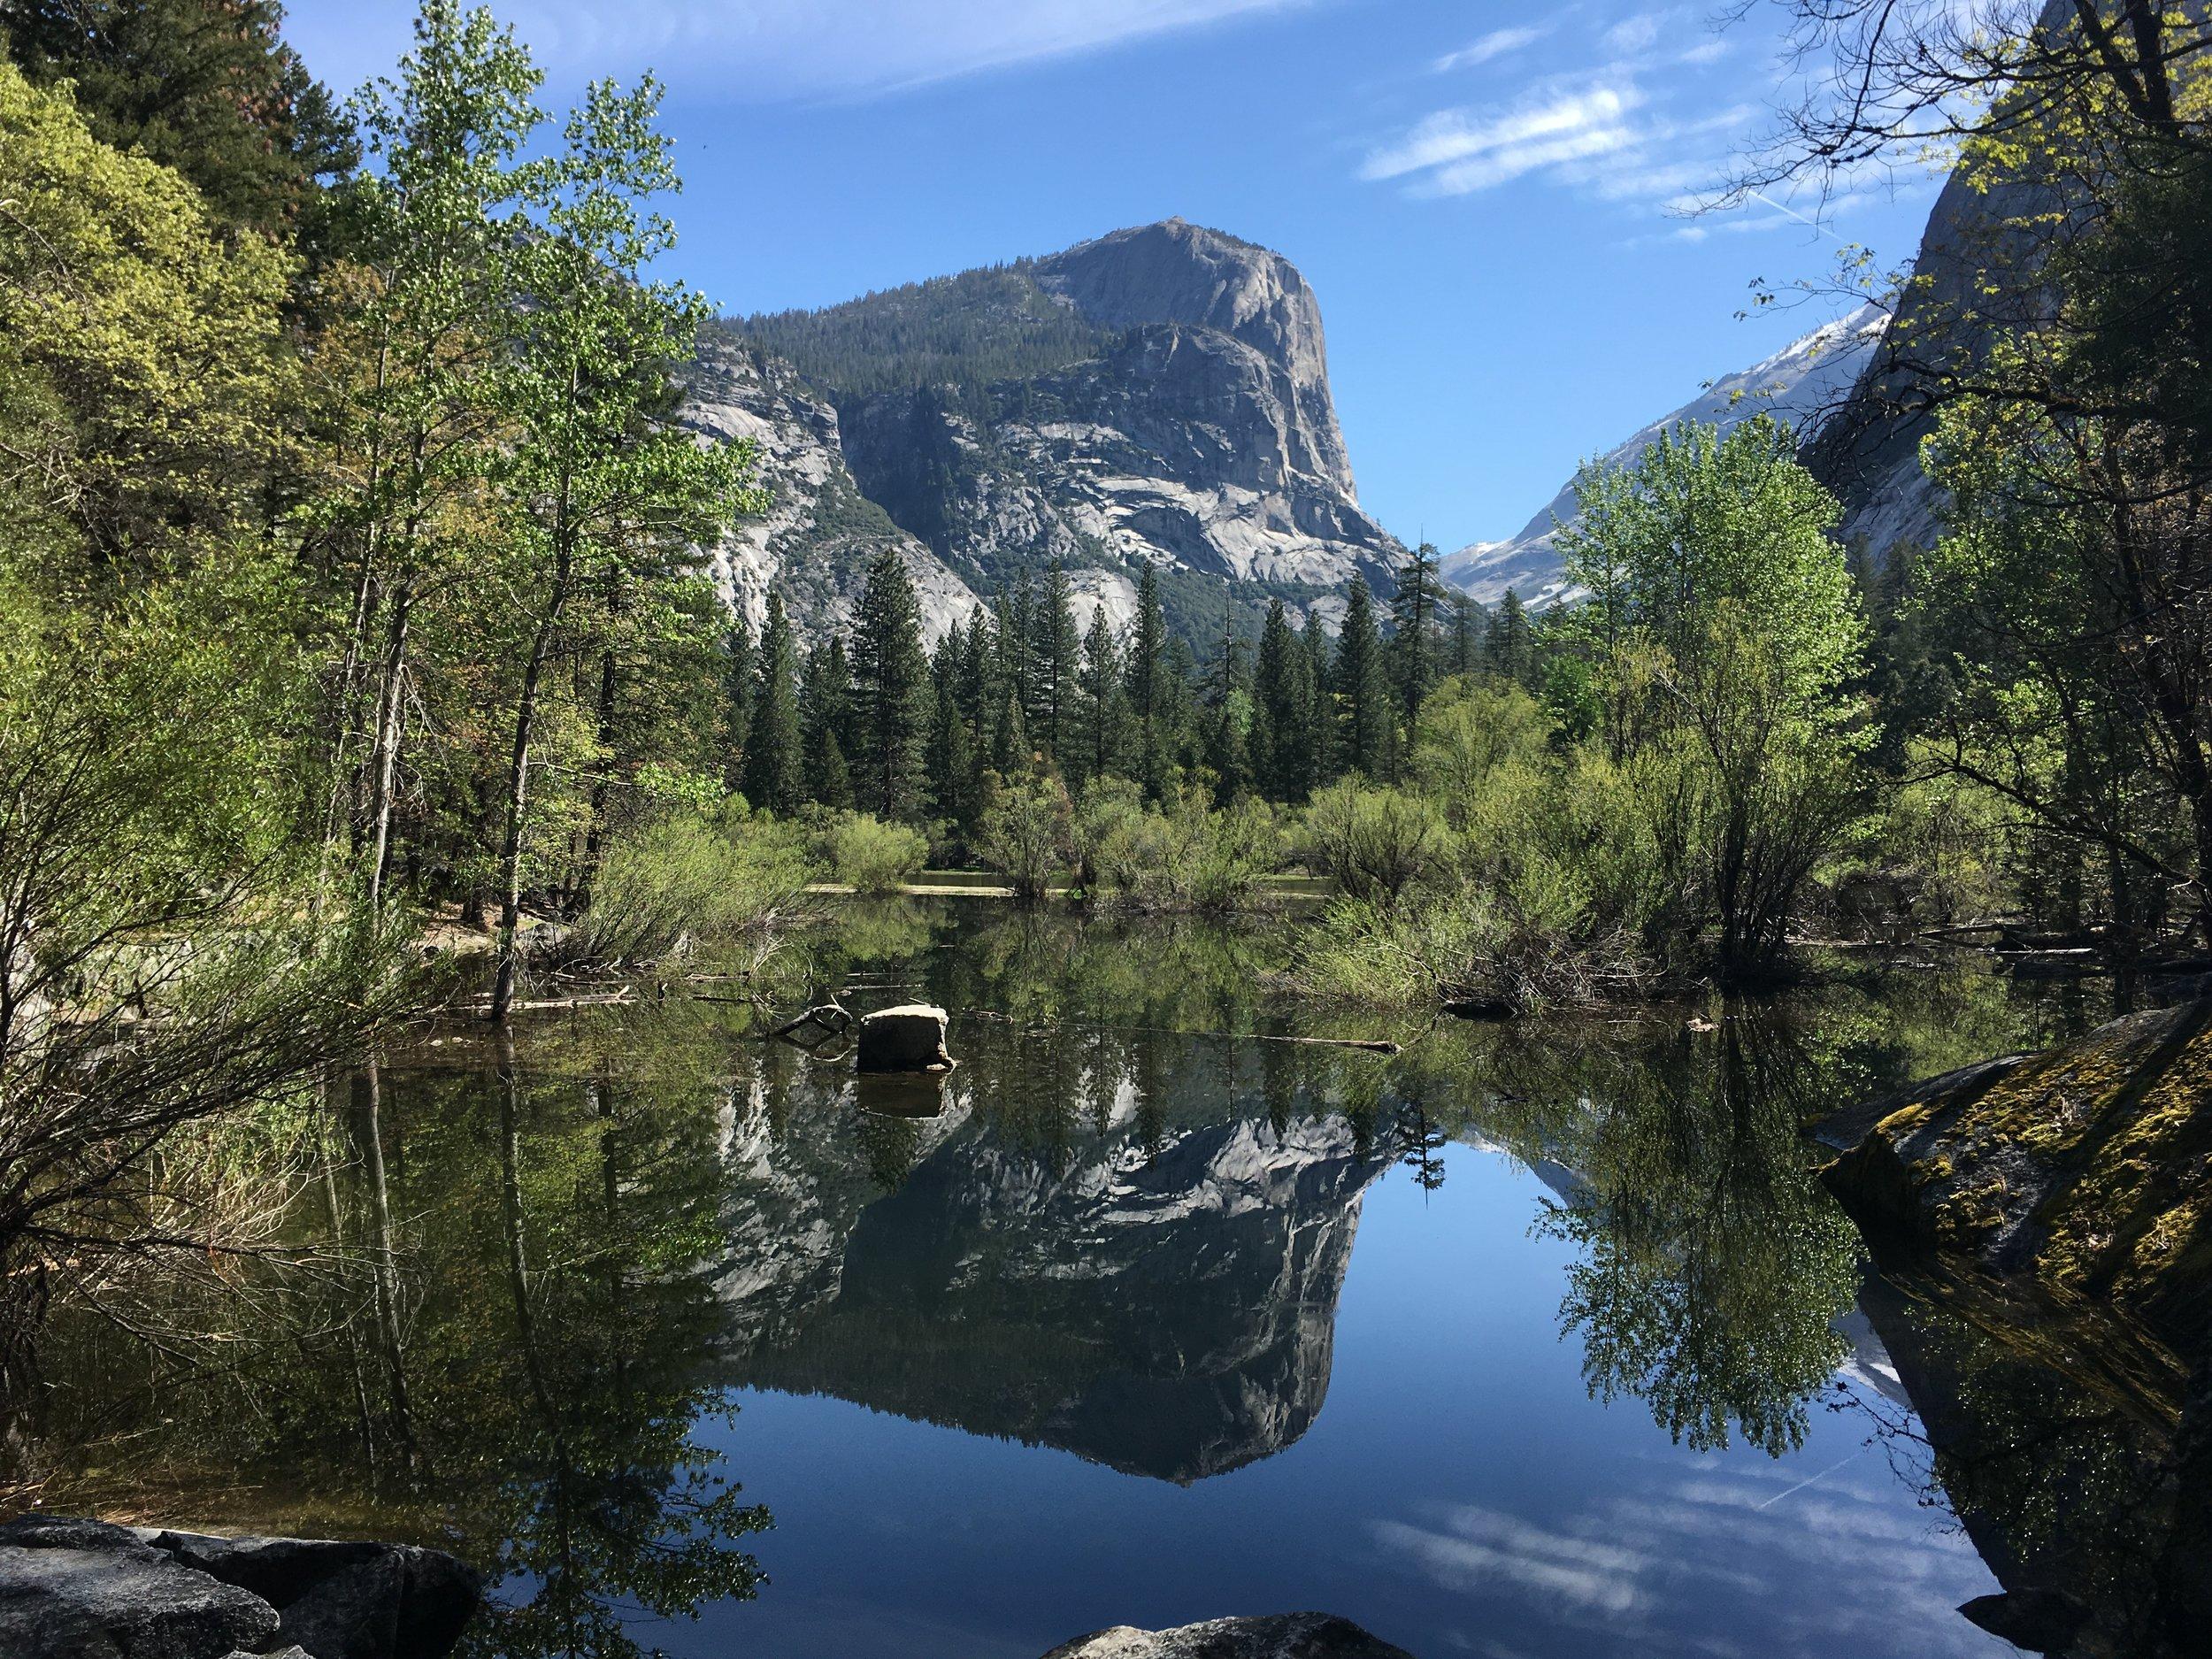 Mirror Lake, at the start of my Yosemite backpacking trip